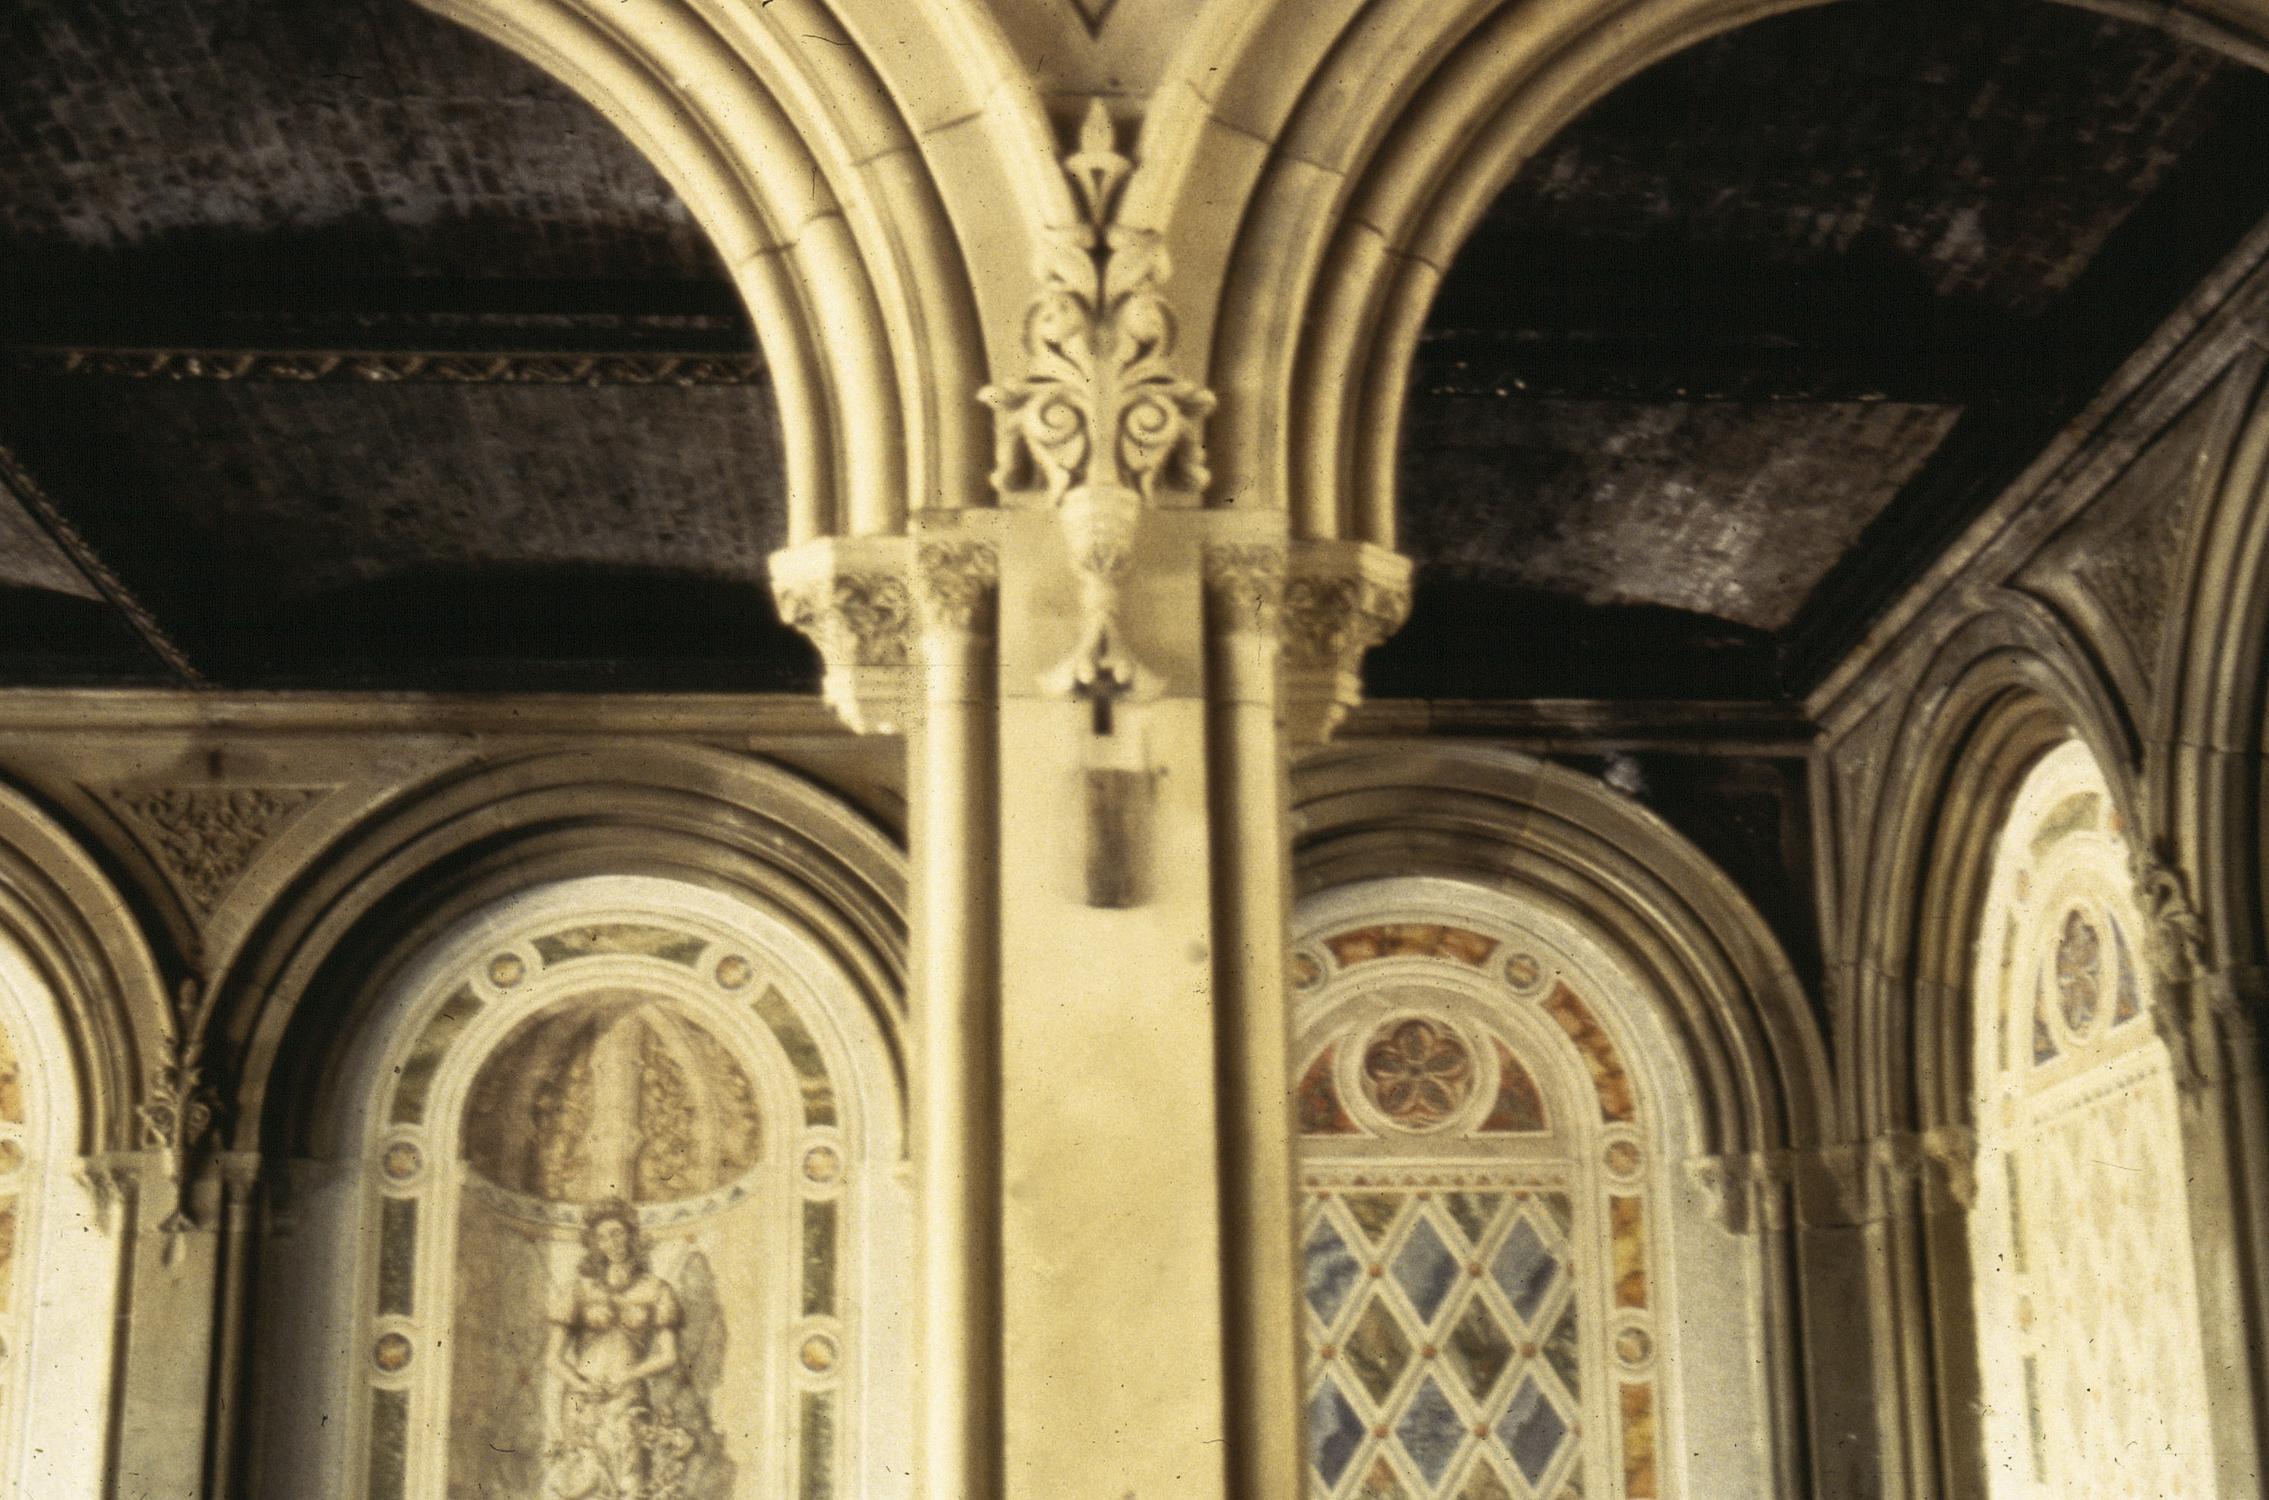 Detail of original limestone ornaments